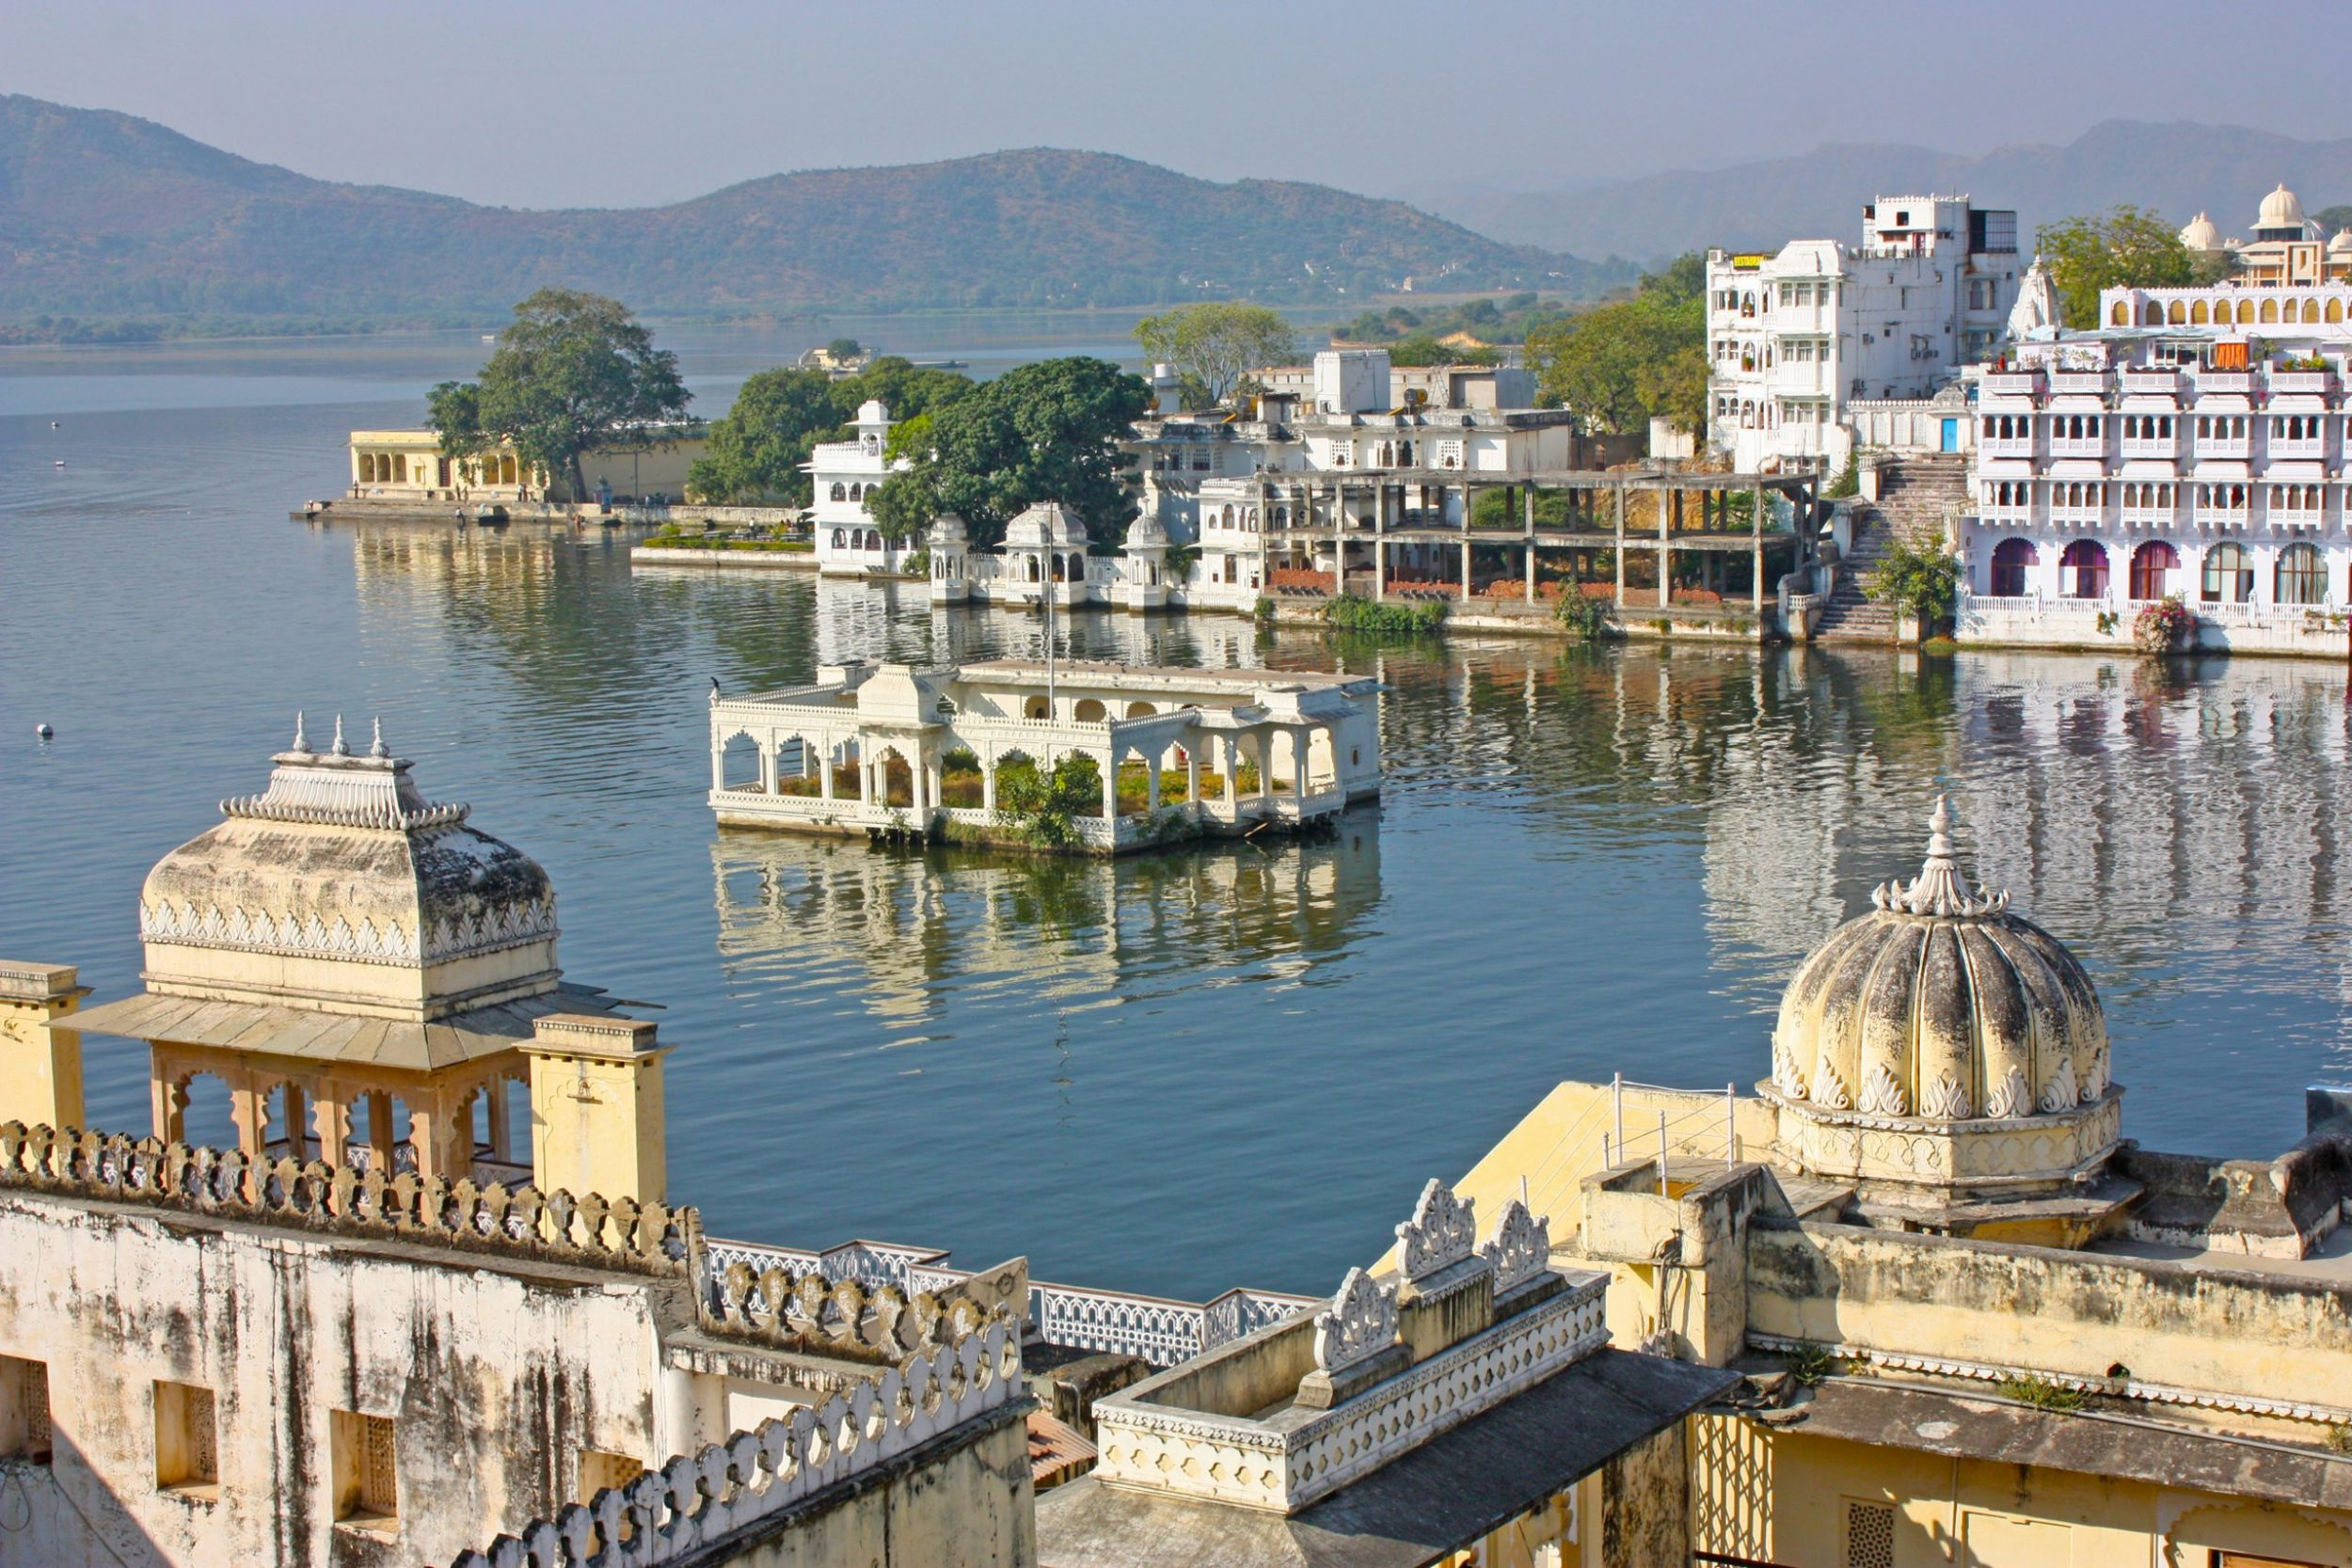 India - Udaipur Lake